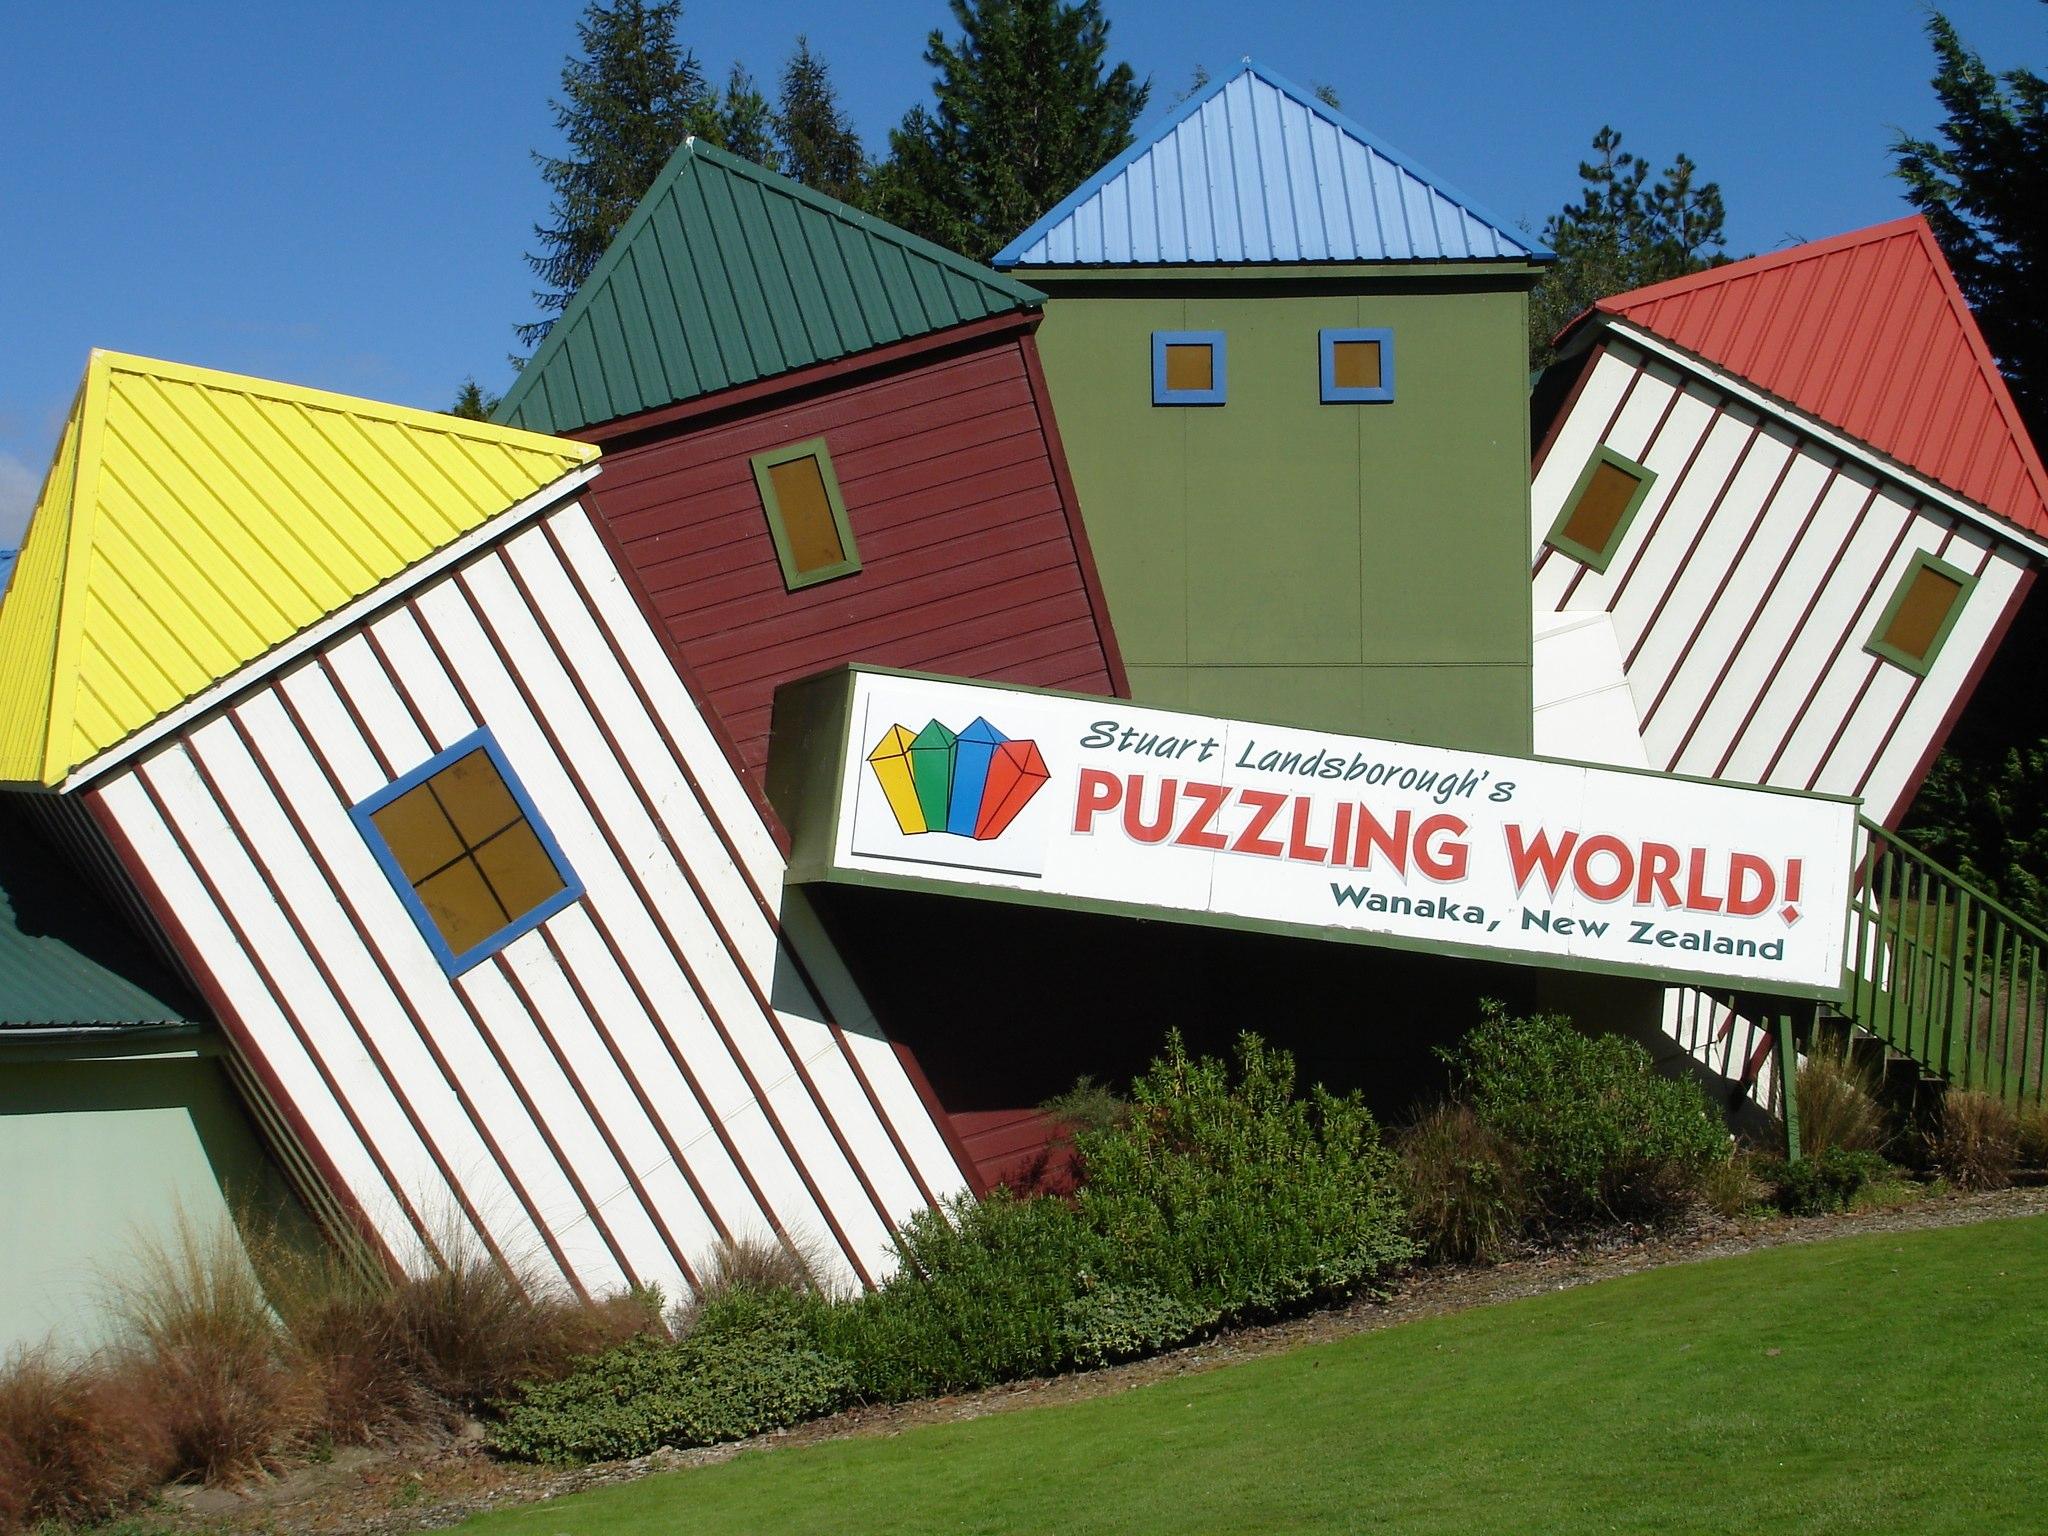 Puzzling World in Wanaka